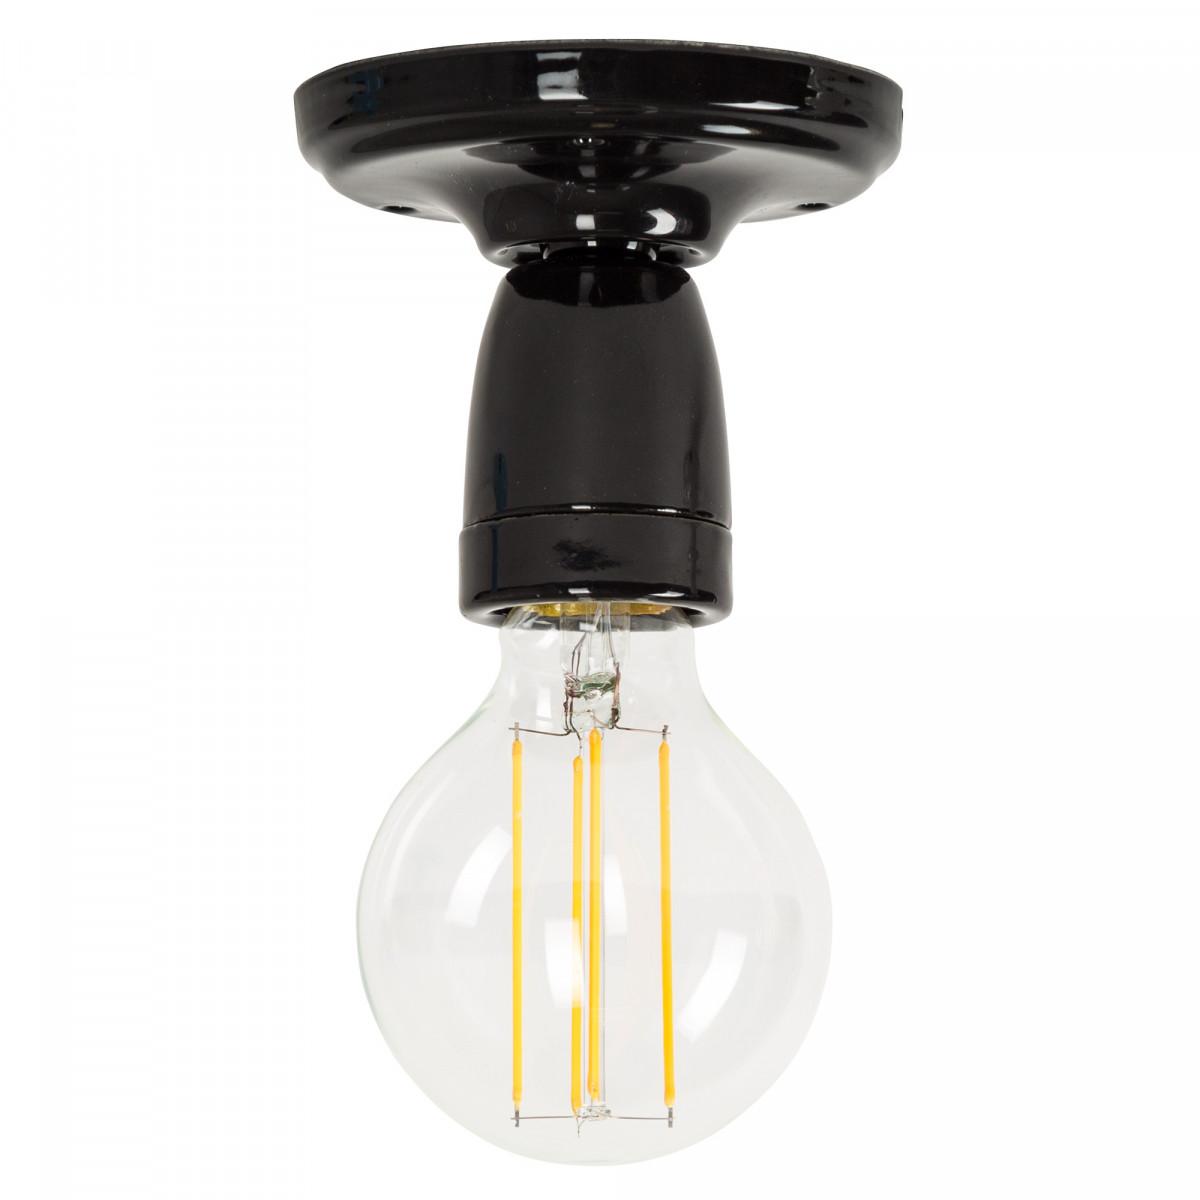 Retro plafondlamp Mir zwart